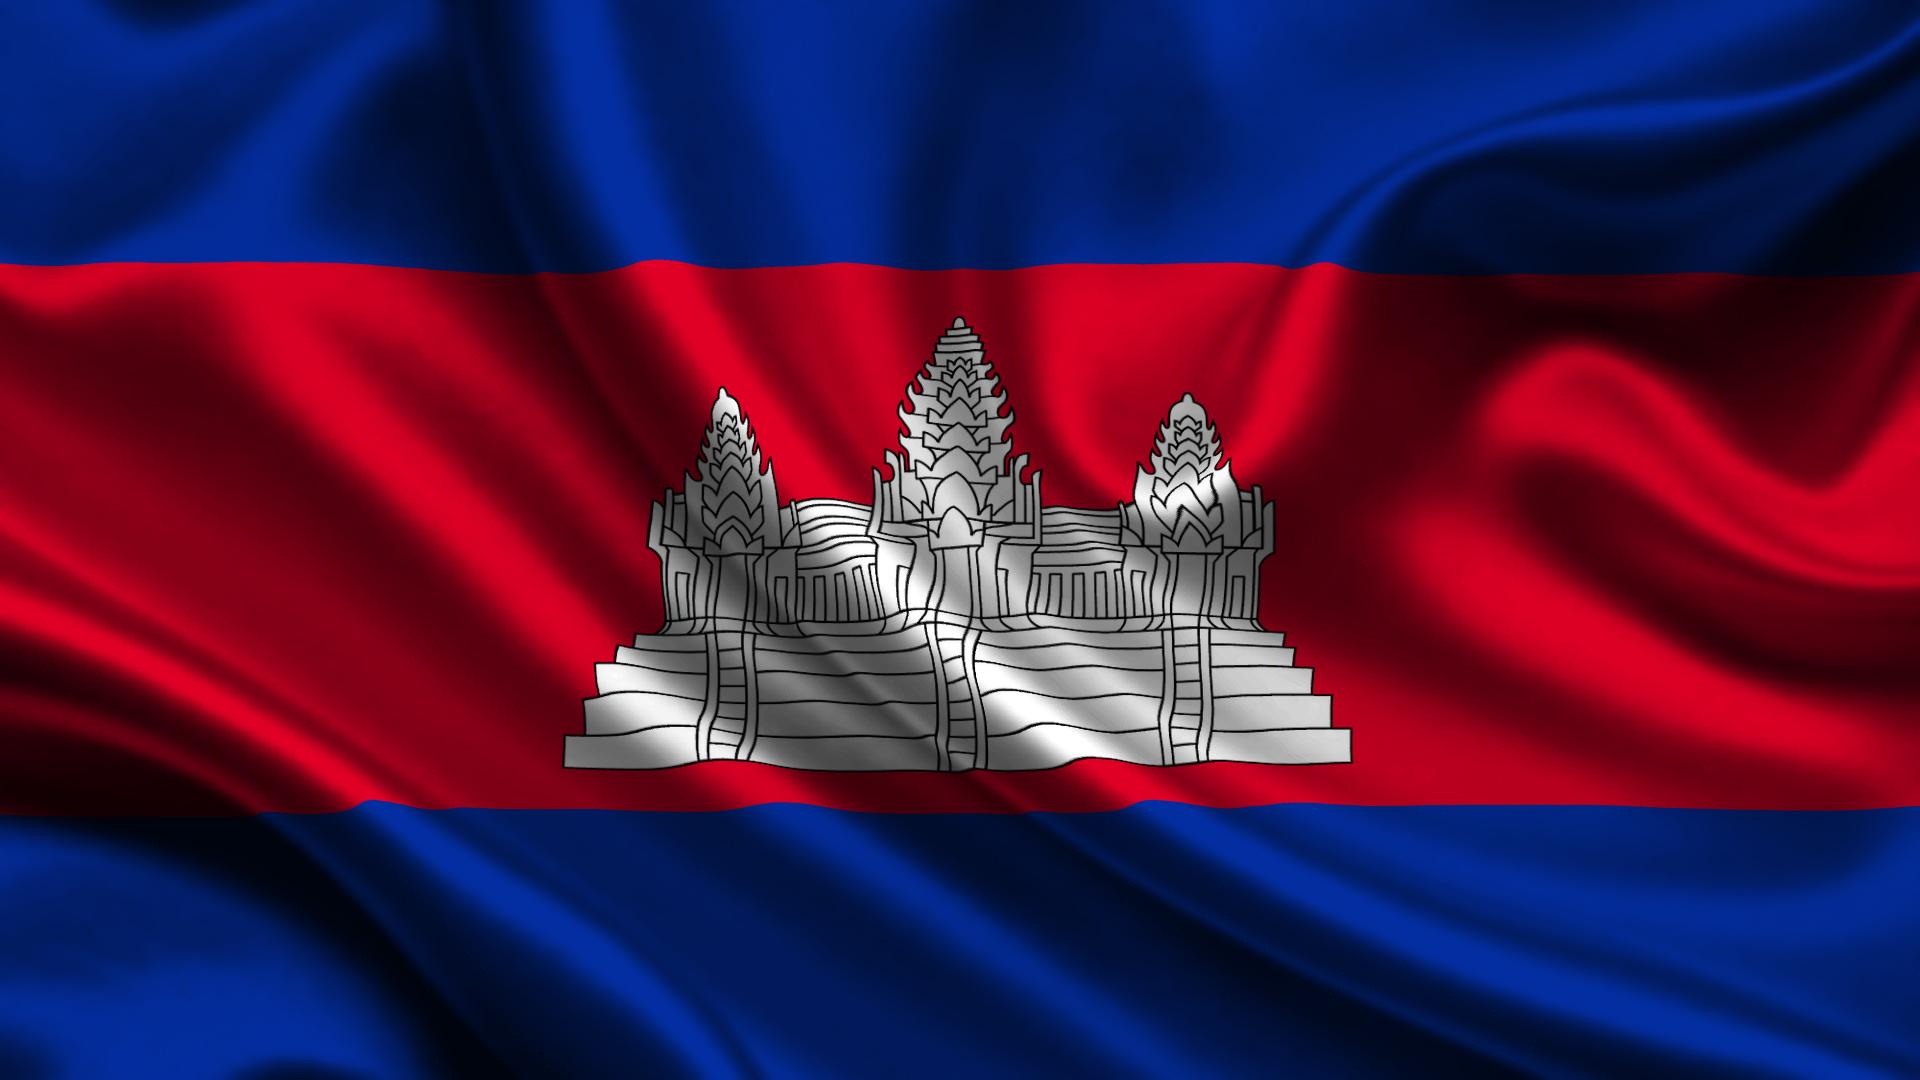 флаг камбоджа фото боеголовка, которая